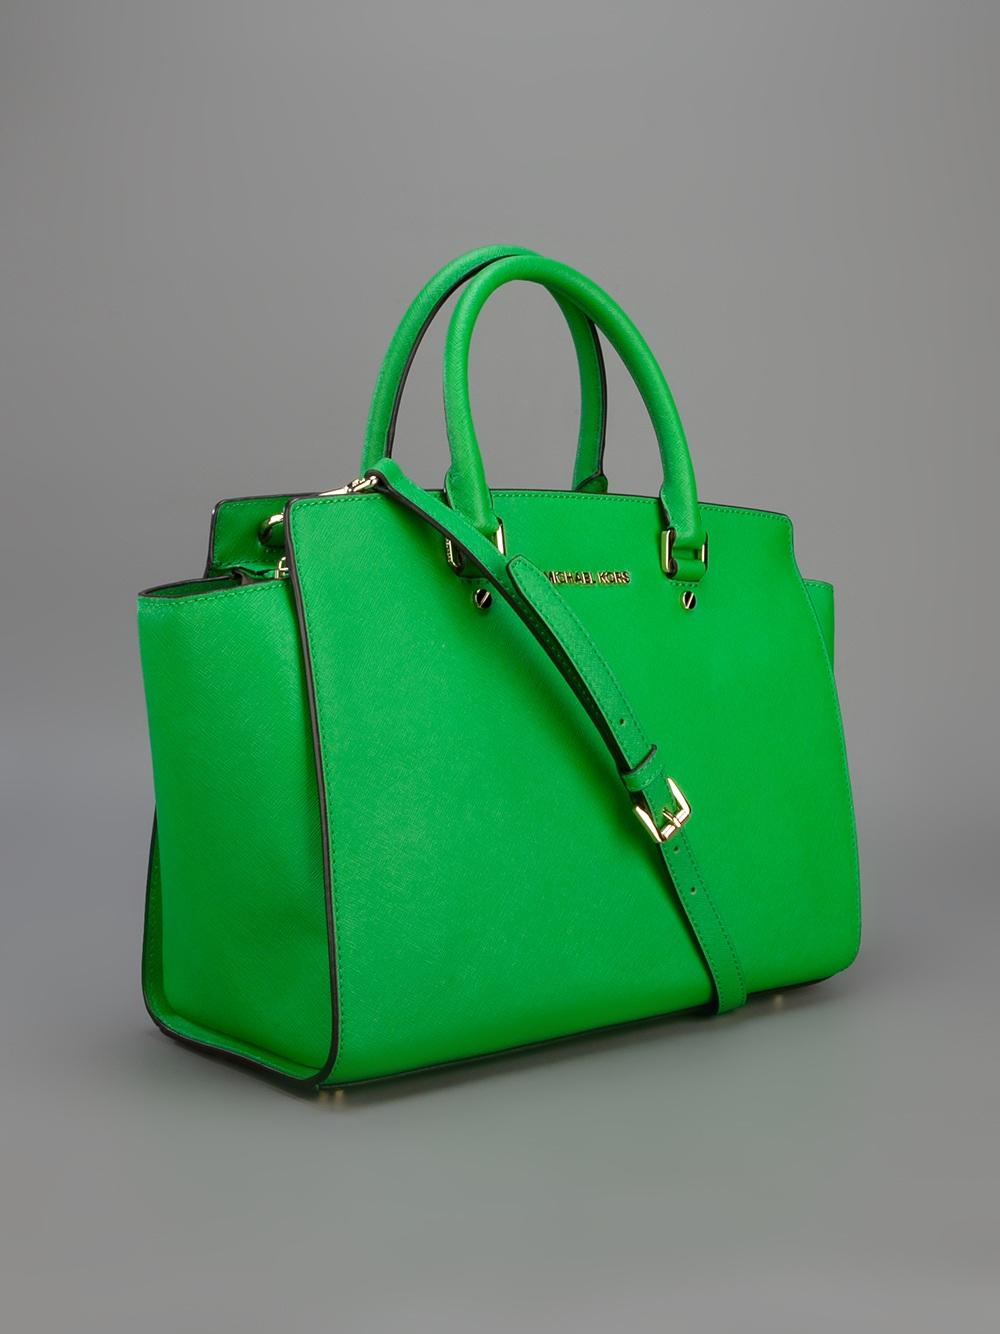 acaad5139dc9 ... australia lyst michael kors selma shopper tote in green b99cd 4c07a